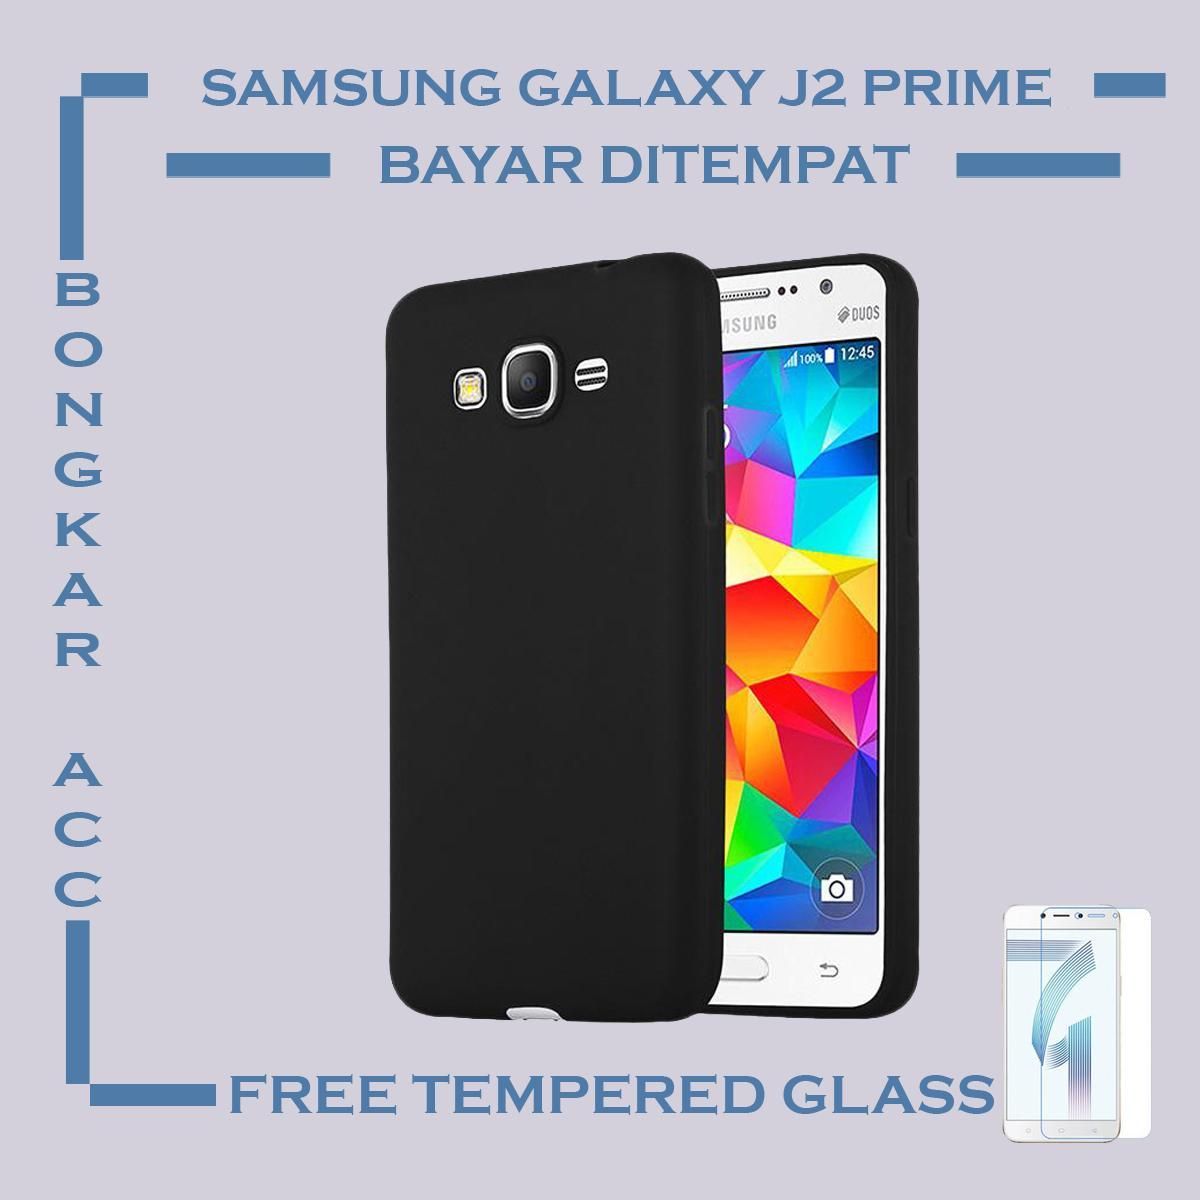 Harga Ready Backdoor Samsung Galaxy J2 Hitam Casing Cover Turup Tutup Belakang Baterai Hp Prime Ultraslim Black Matte Silikon Polos Case